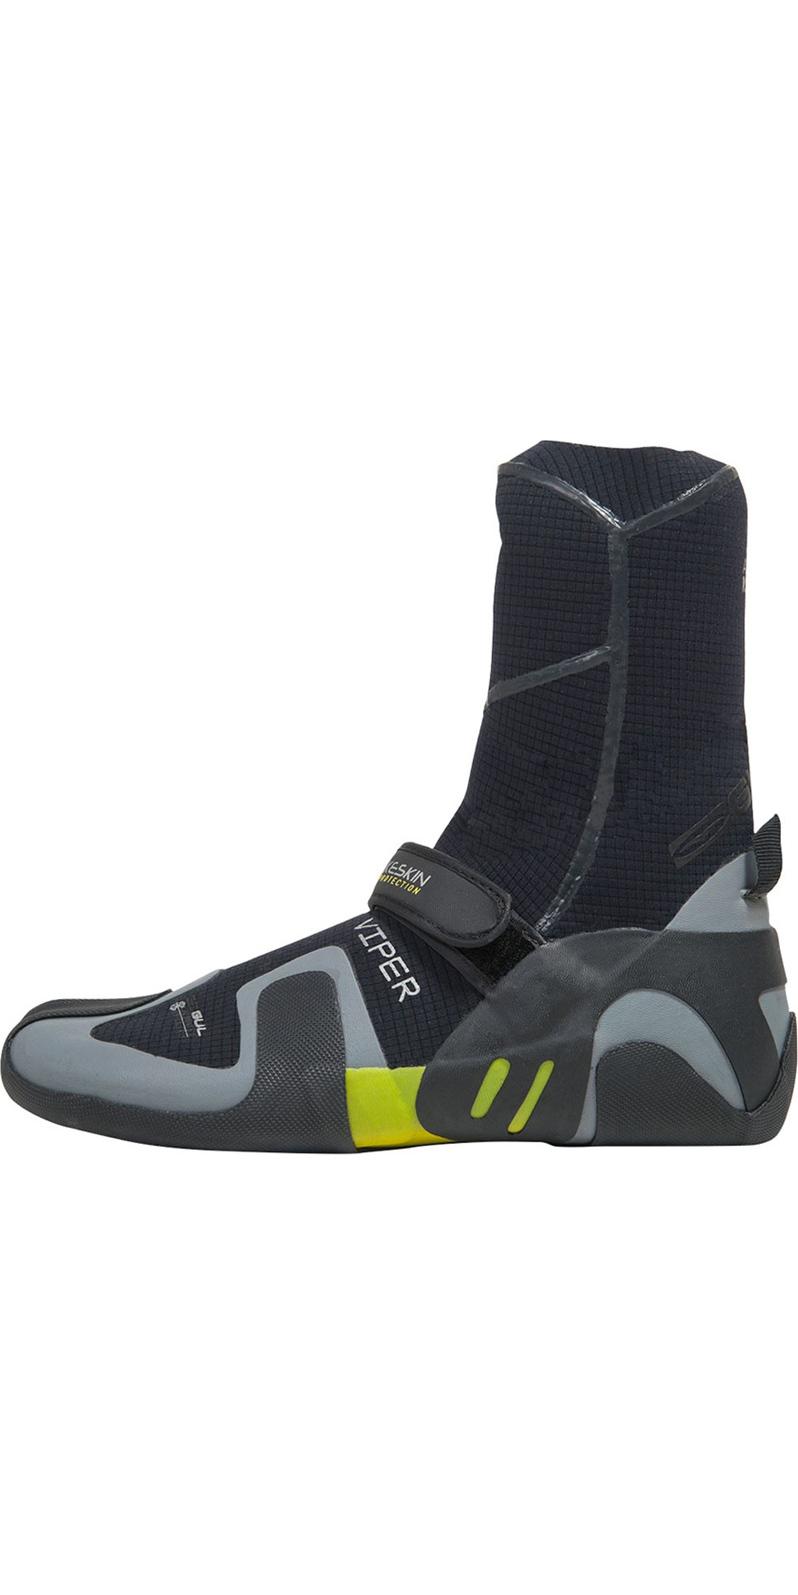 f6362fbdf0e58 2018 Gul Viper 5mm Split Toe Wetsuit Boot Sort GUL BO1259-A9 ...